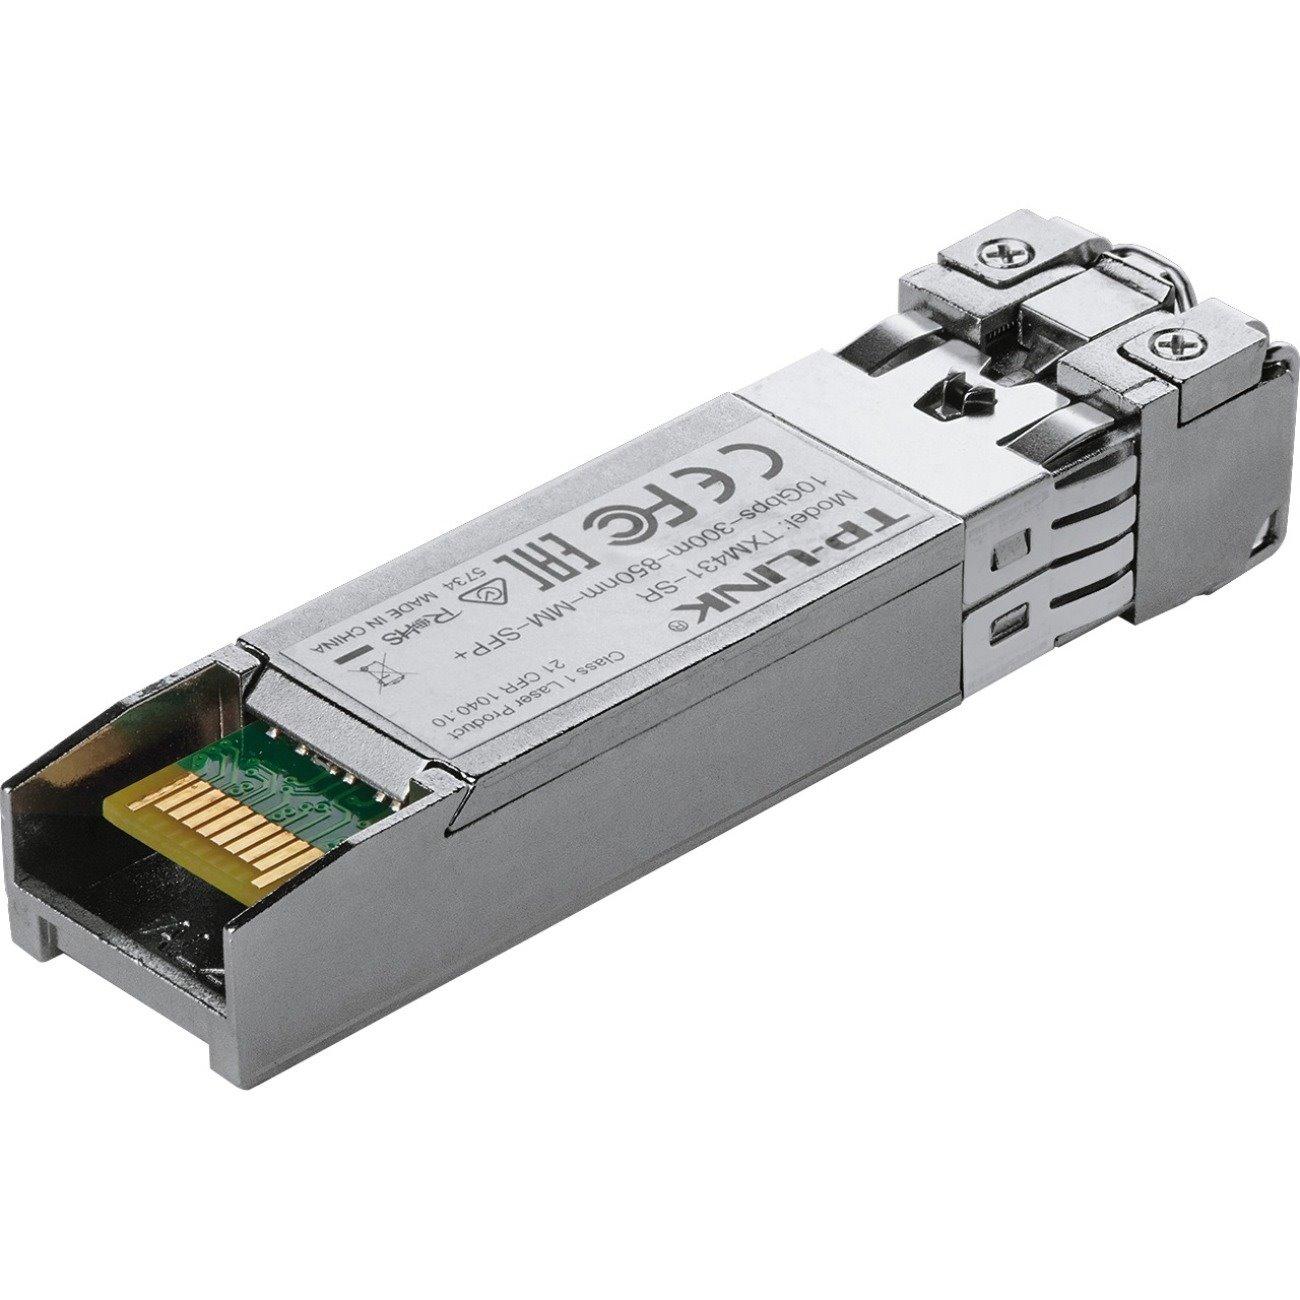 TP-LINK TXM431-SR SFP+ - 1 LC/UPC 10GBase-SR Network